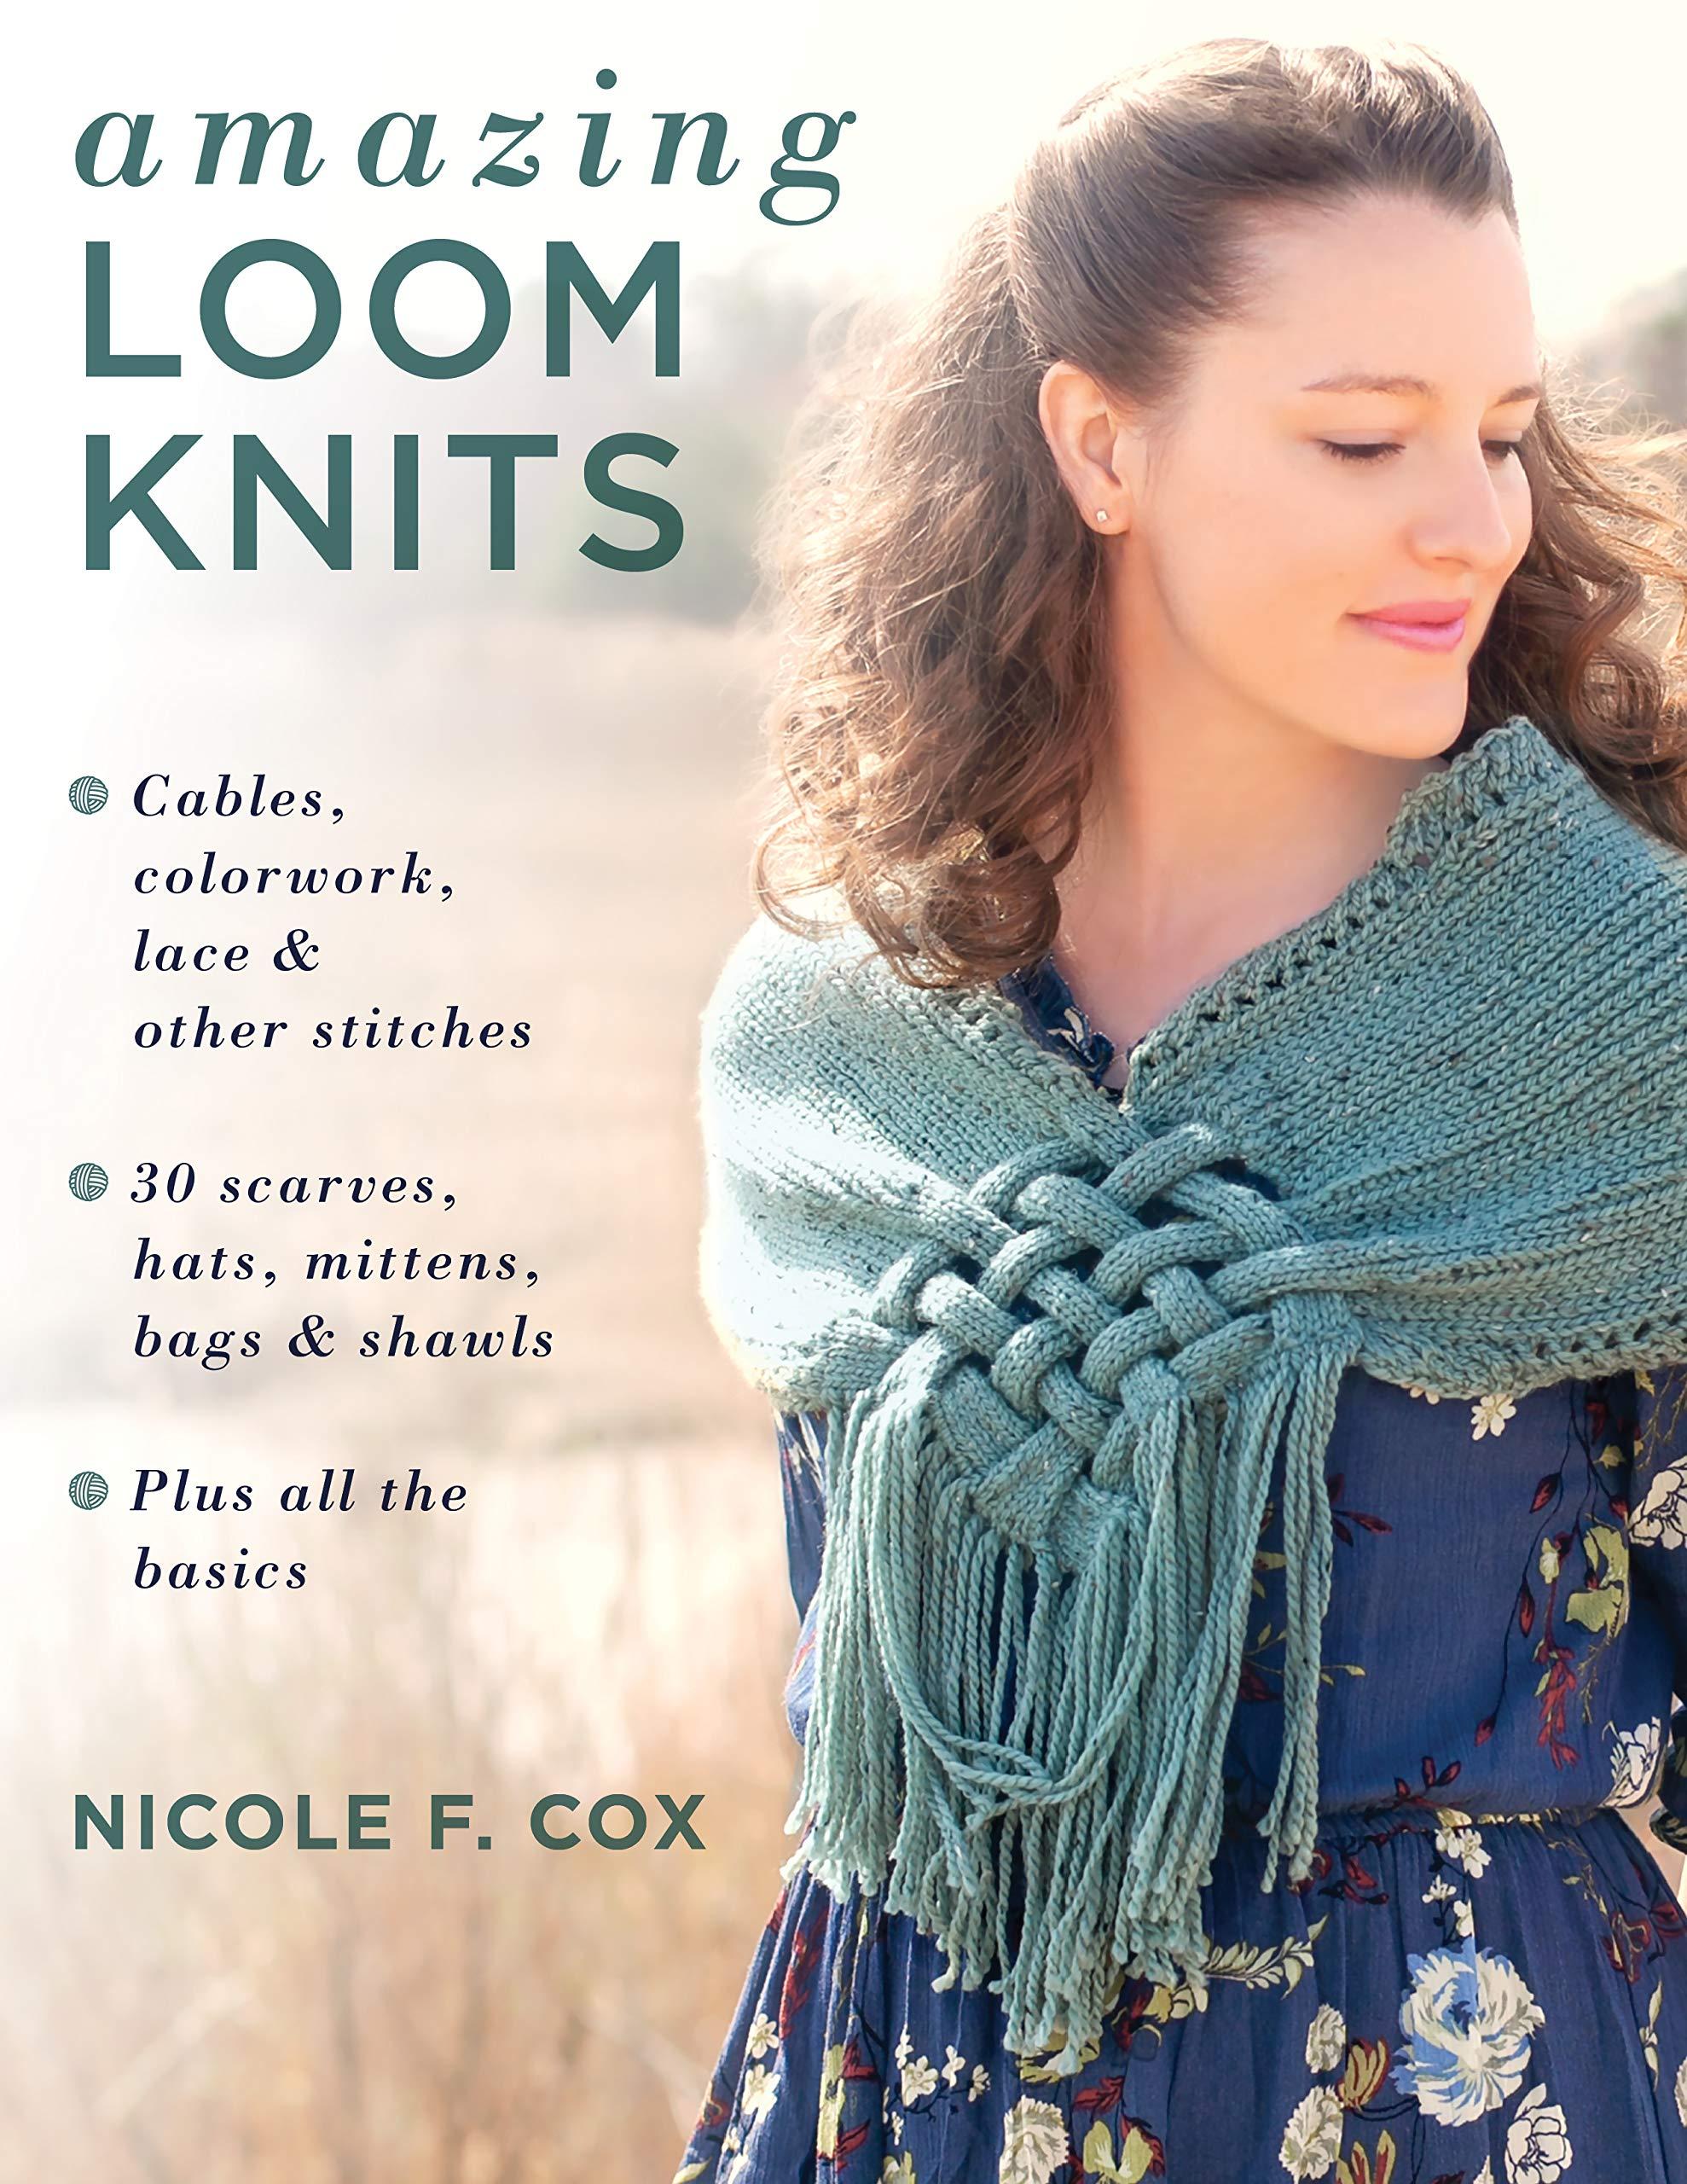 Amazing Loom Knits colorwork stitches product image